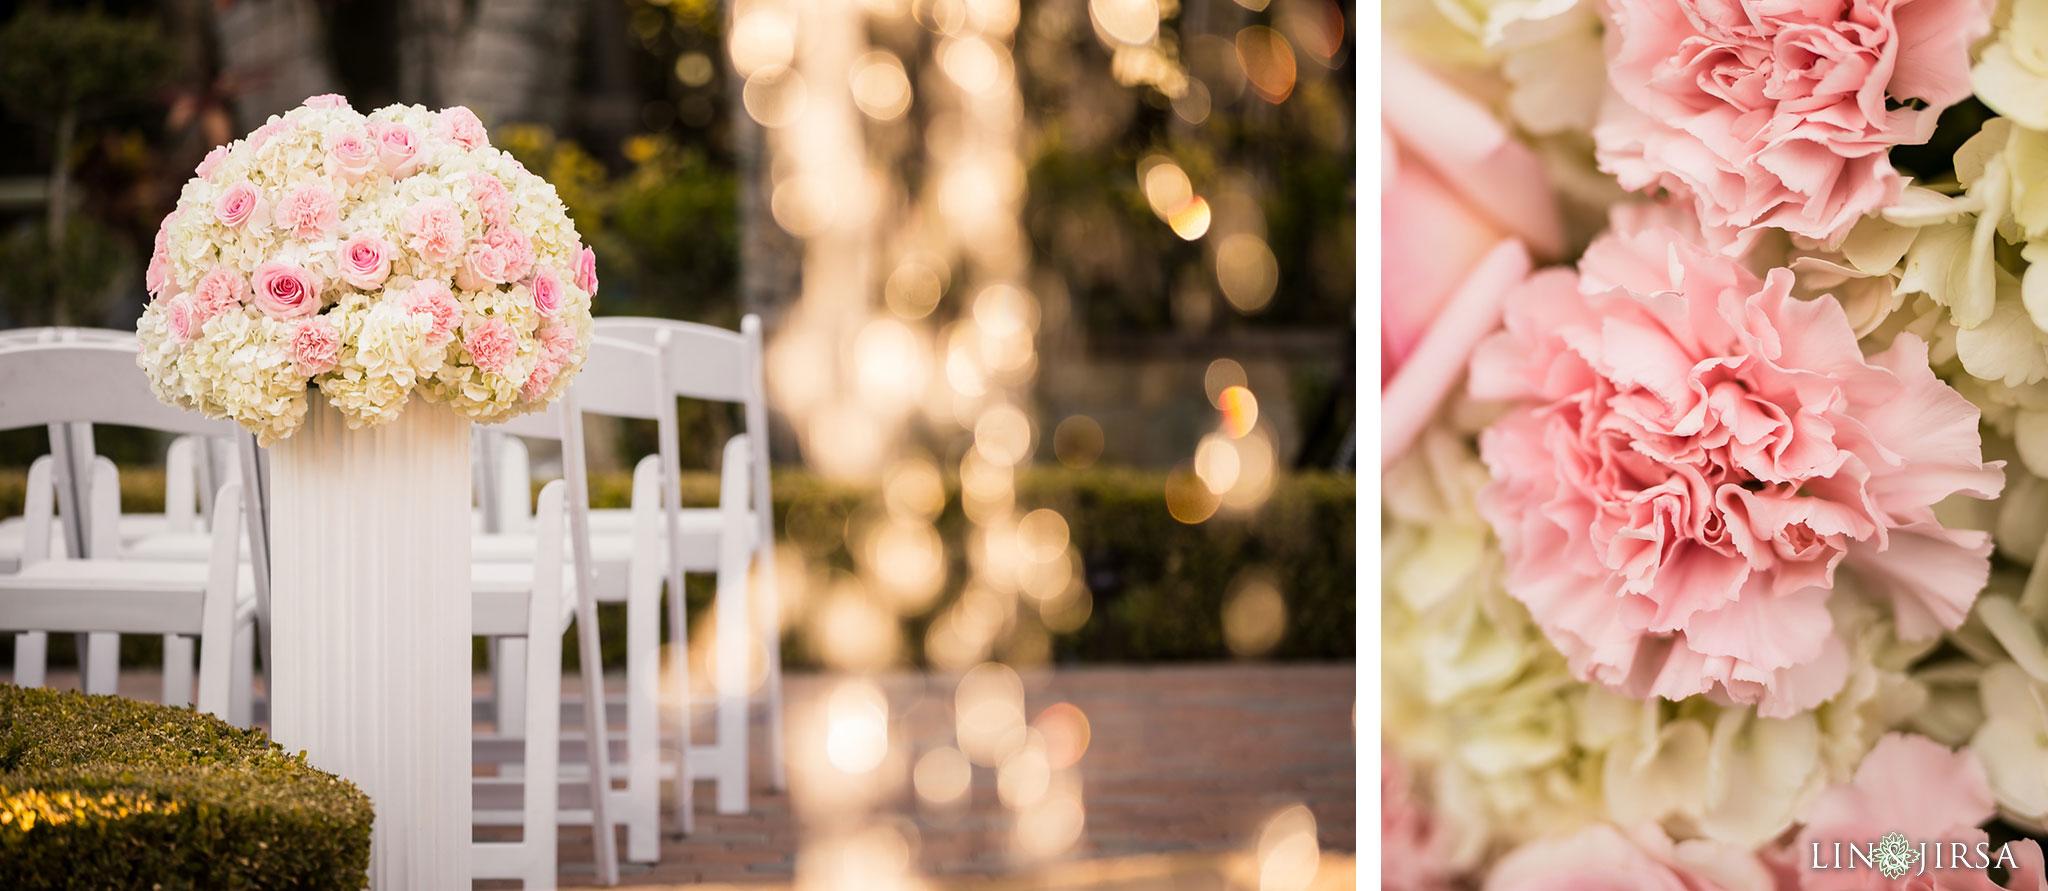 12 taglyan complex los angeles wedding photography